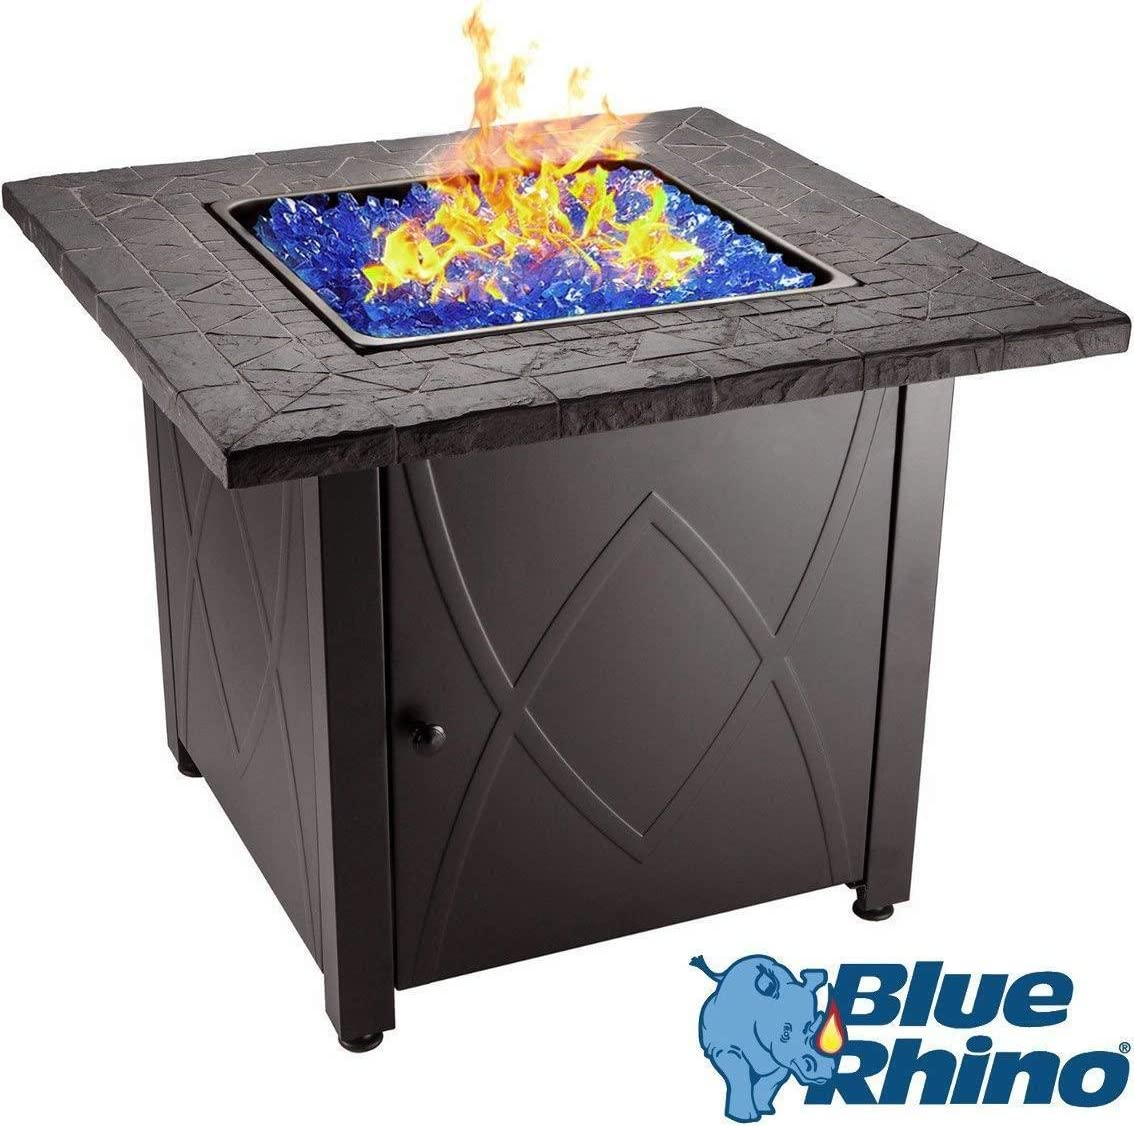 Blue Rhino Outdoor Propane Gas Fire Pit (Blue Fireglass)